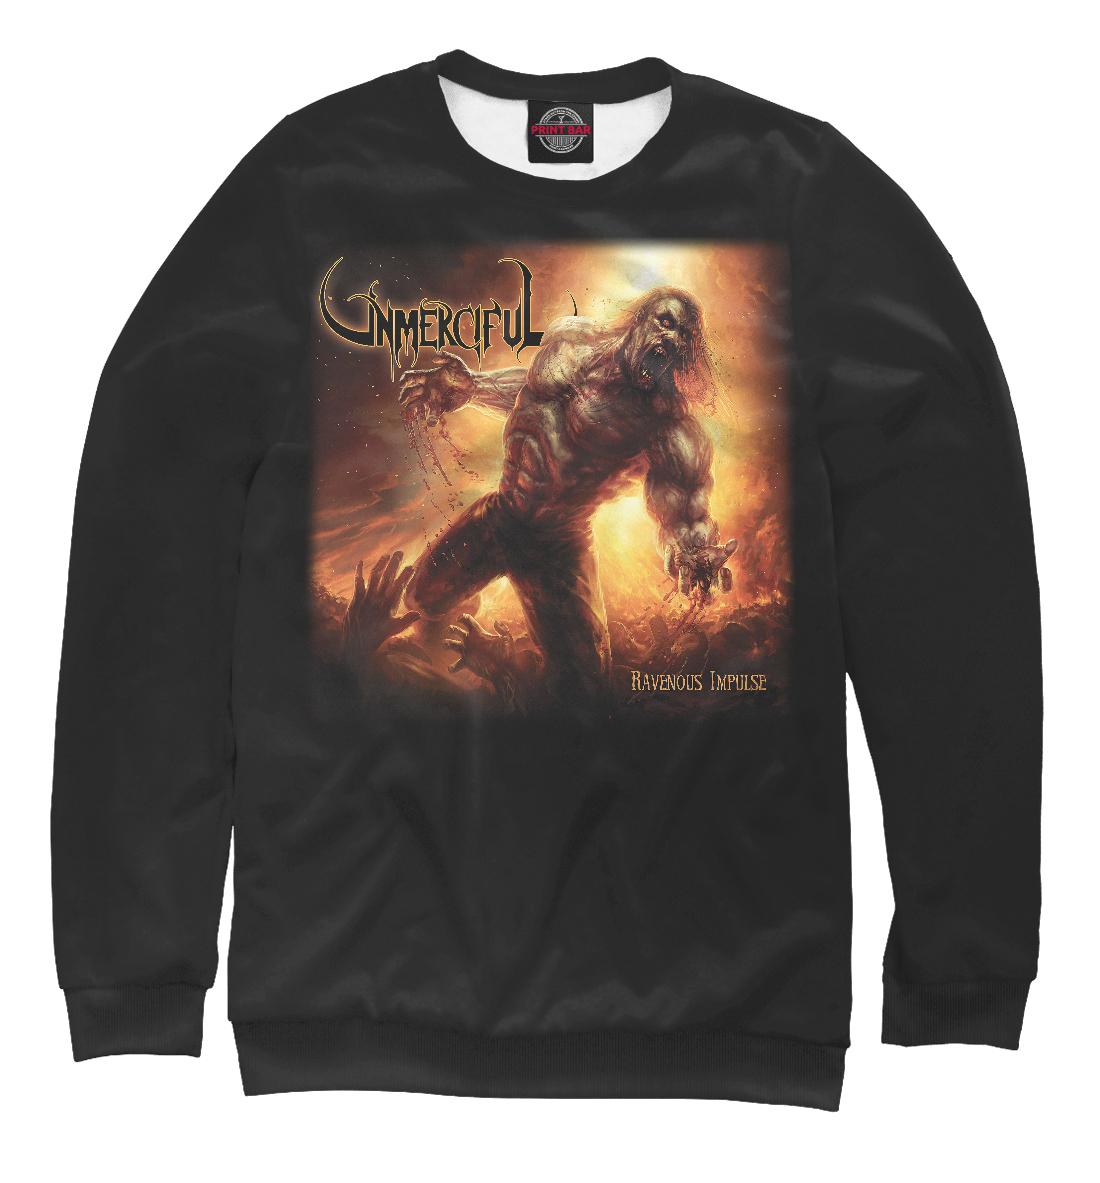 Купить Unmerciful - death metal band, Printbar, Свитшоты, MZK-277570-swi-1